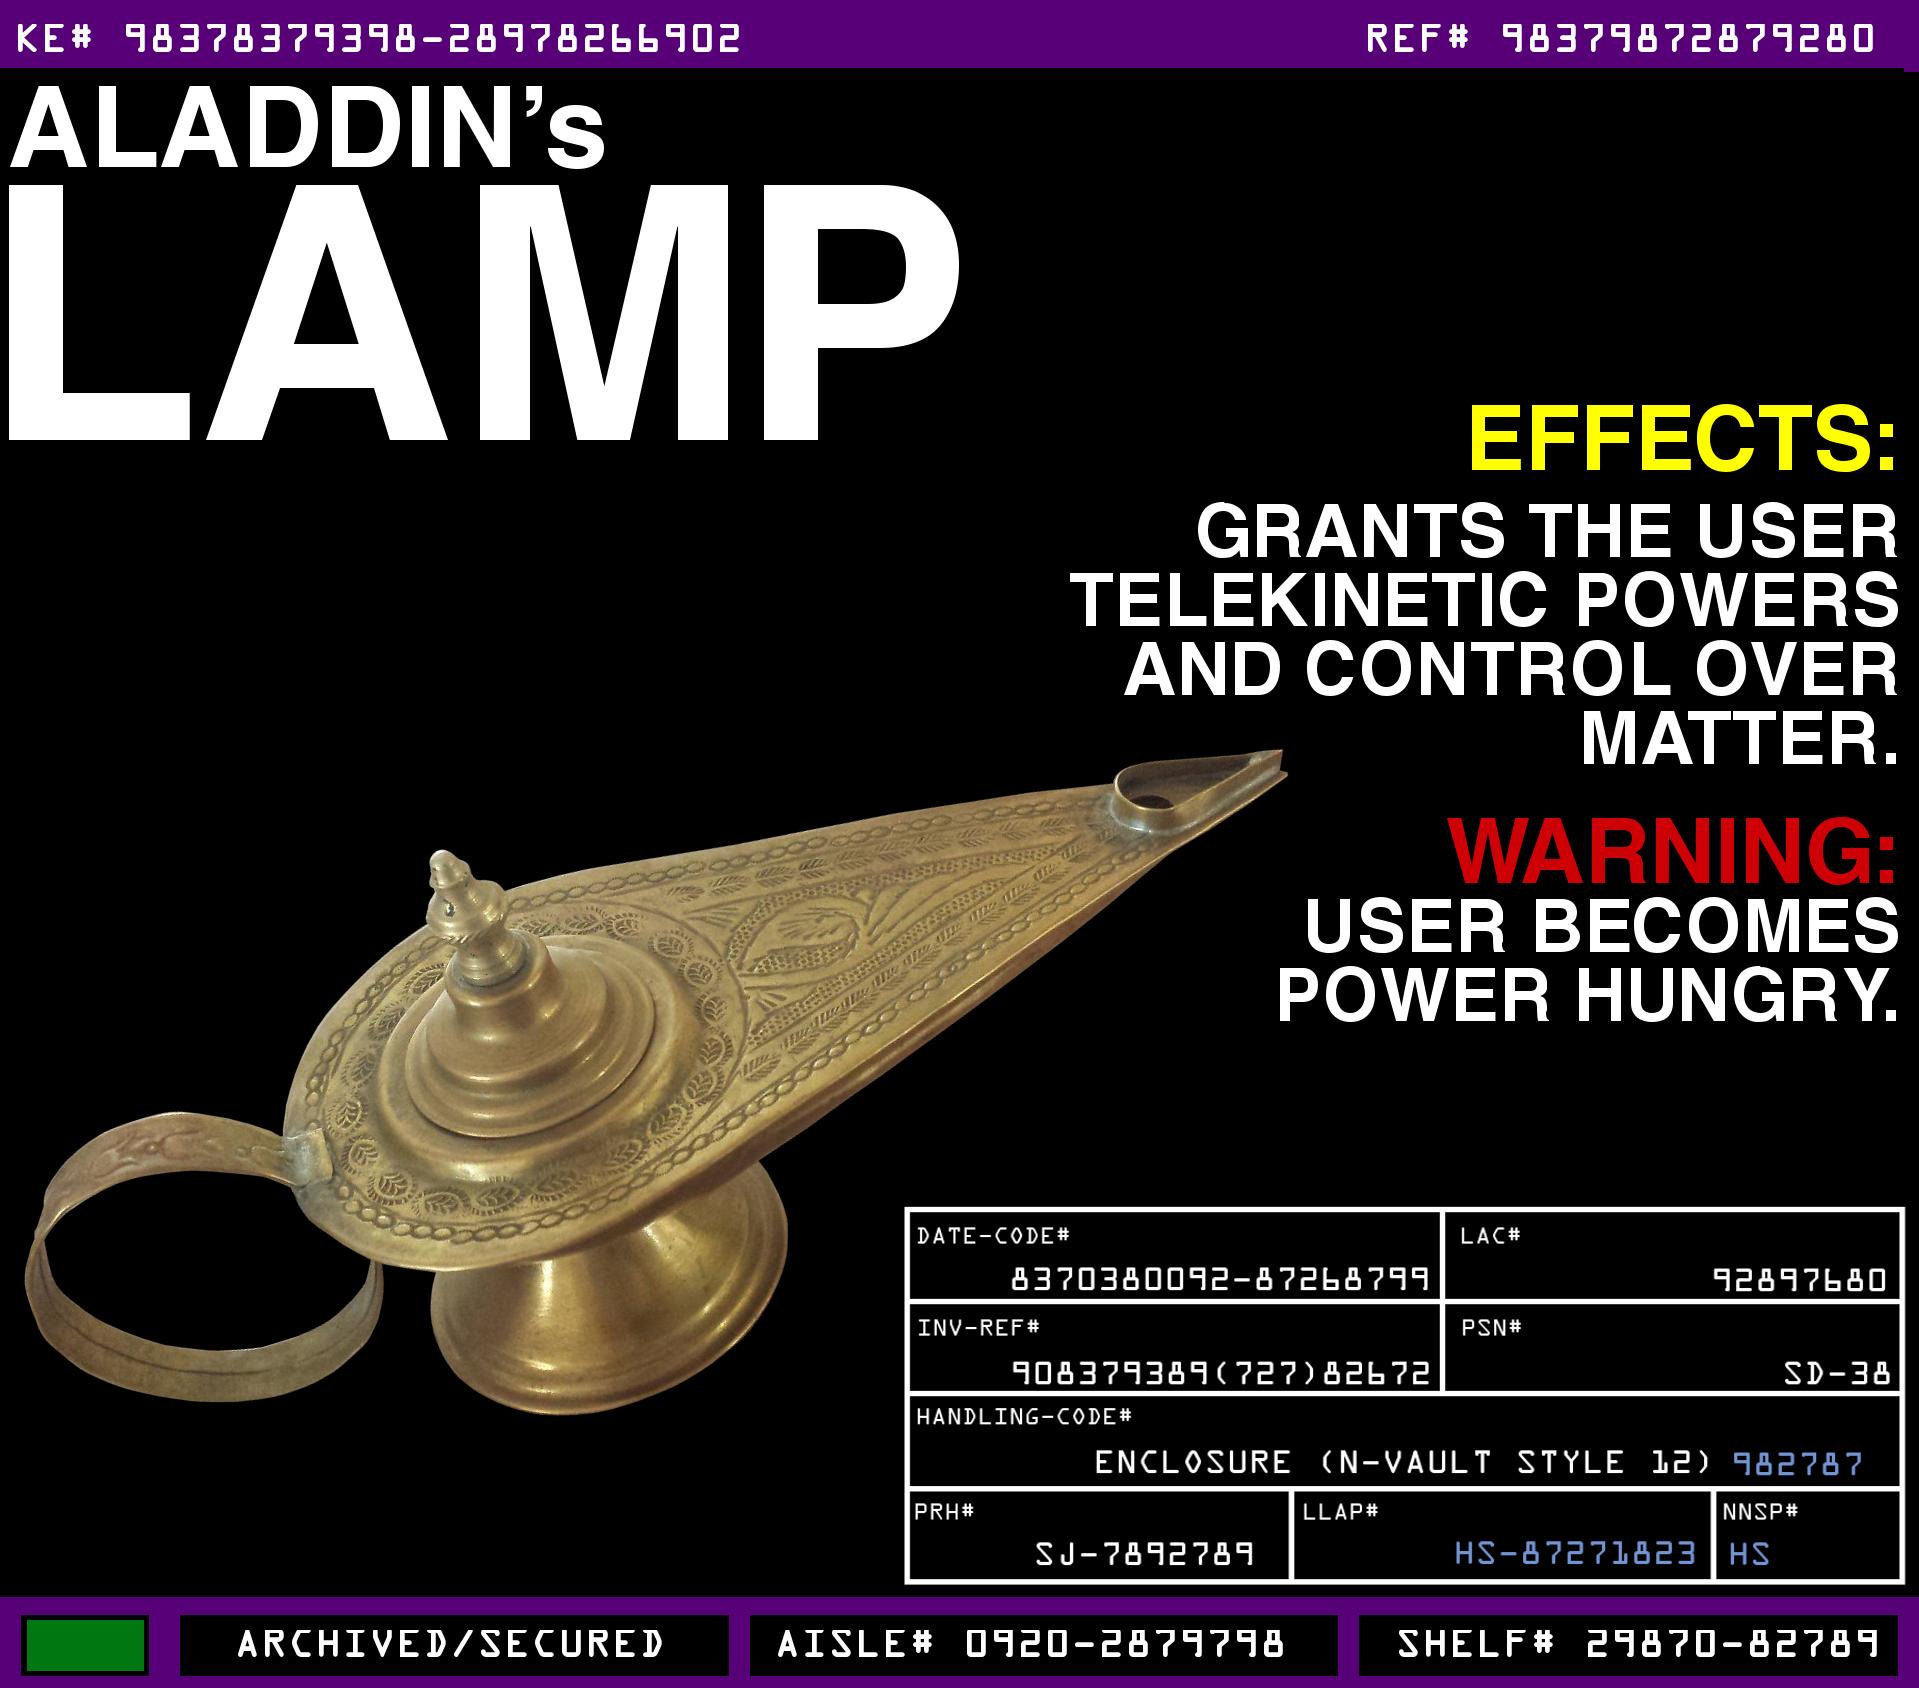 Image - Aladdin's Lamp (CARD-1).png